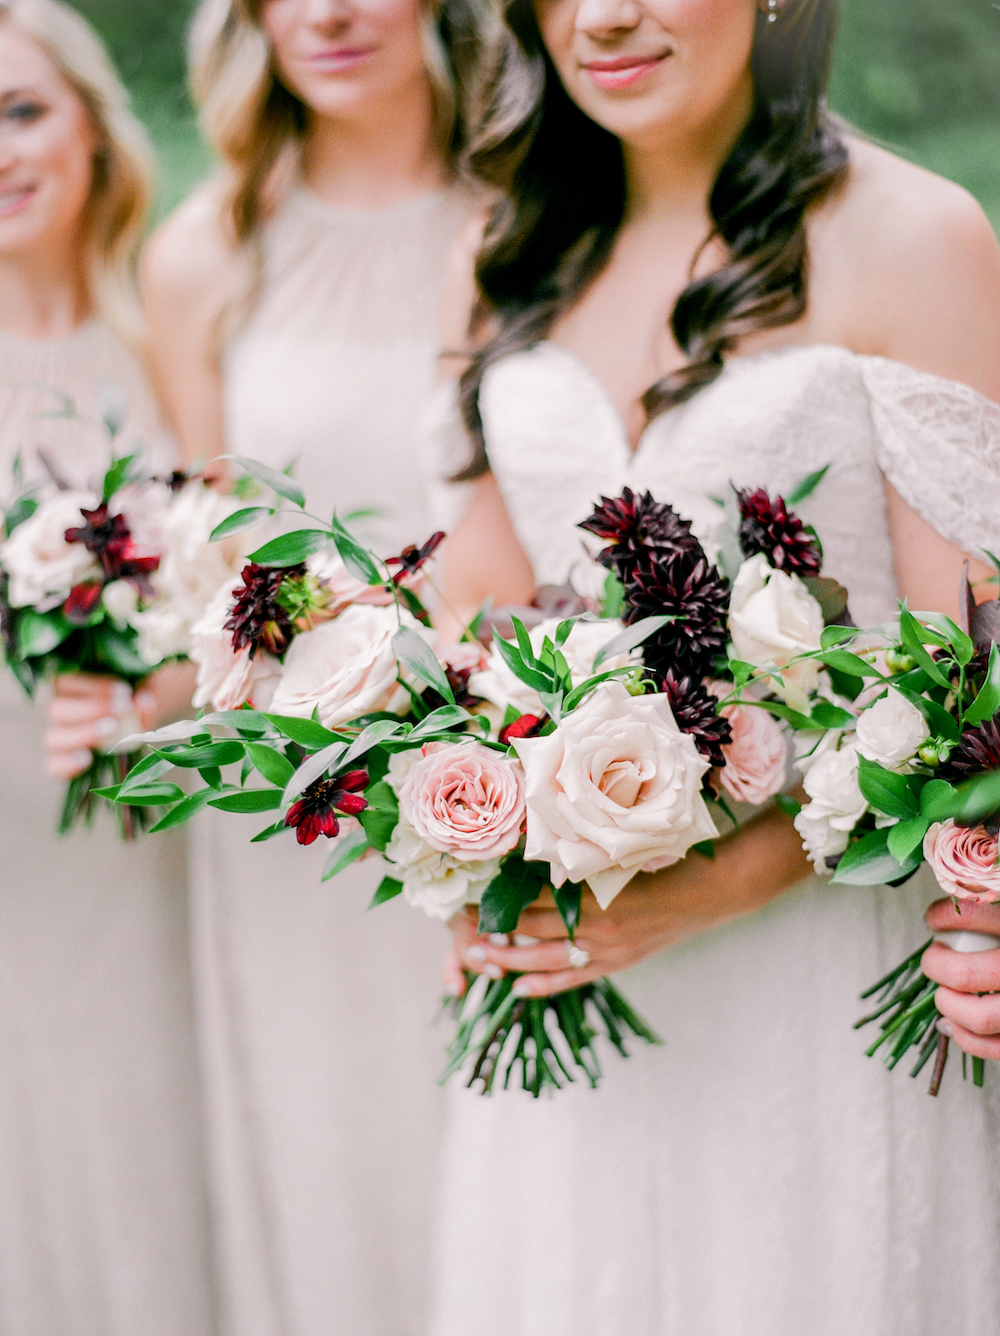 Garden Inspired Wedding Bouquets - Stone House Creative